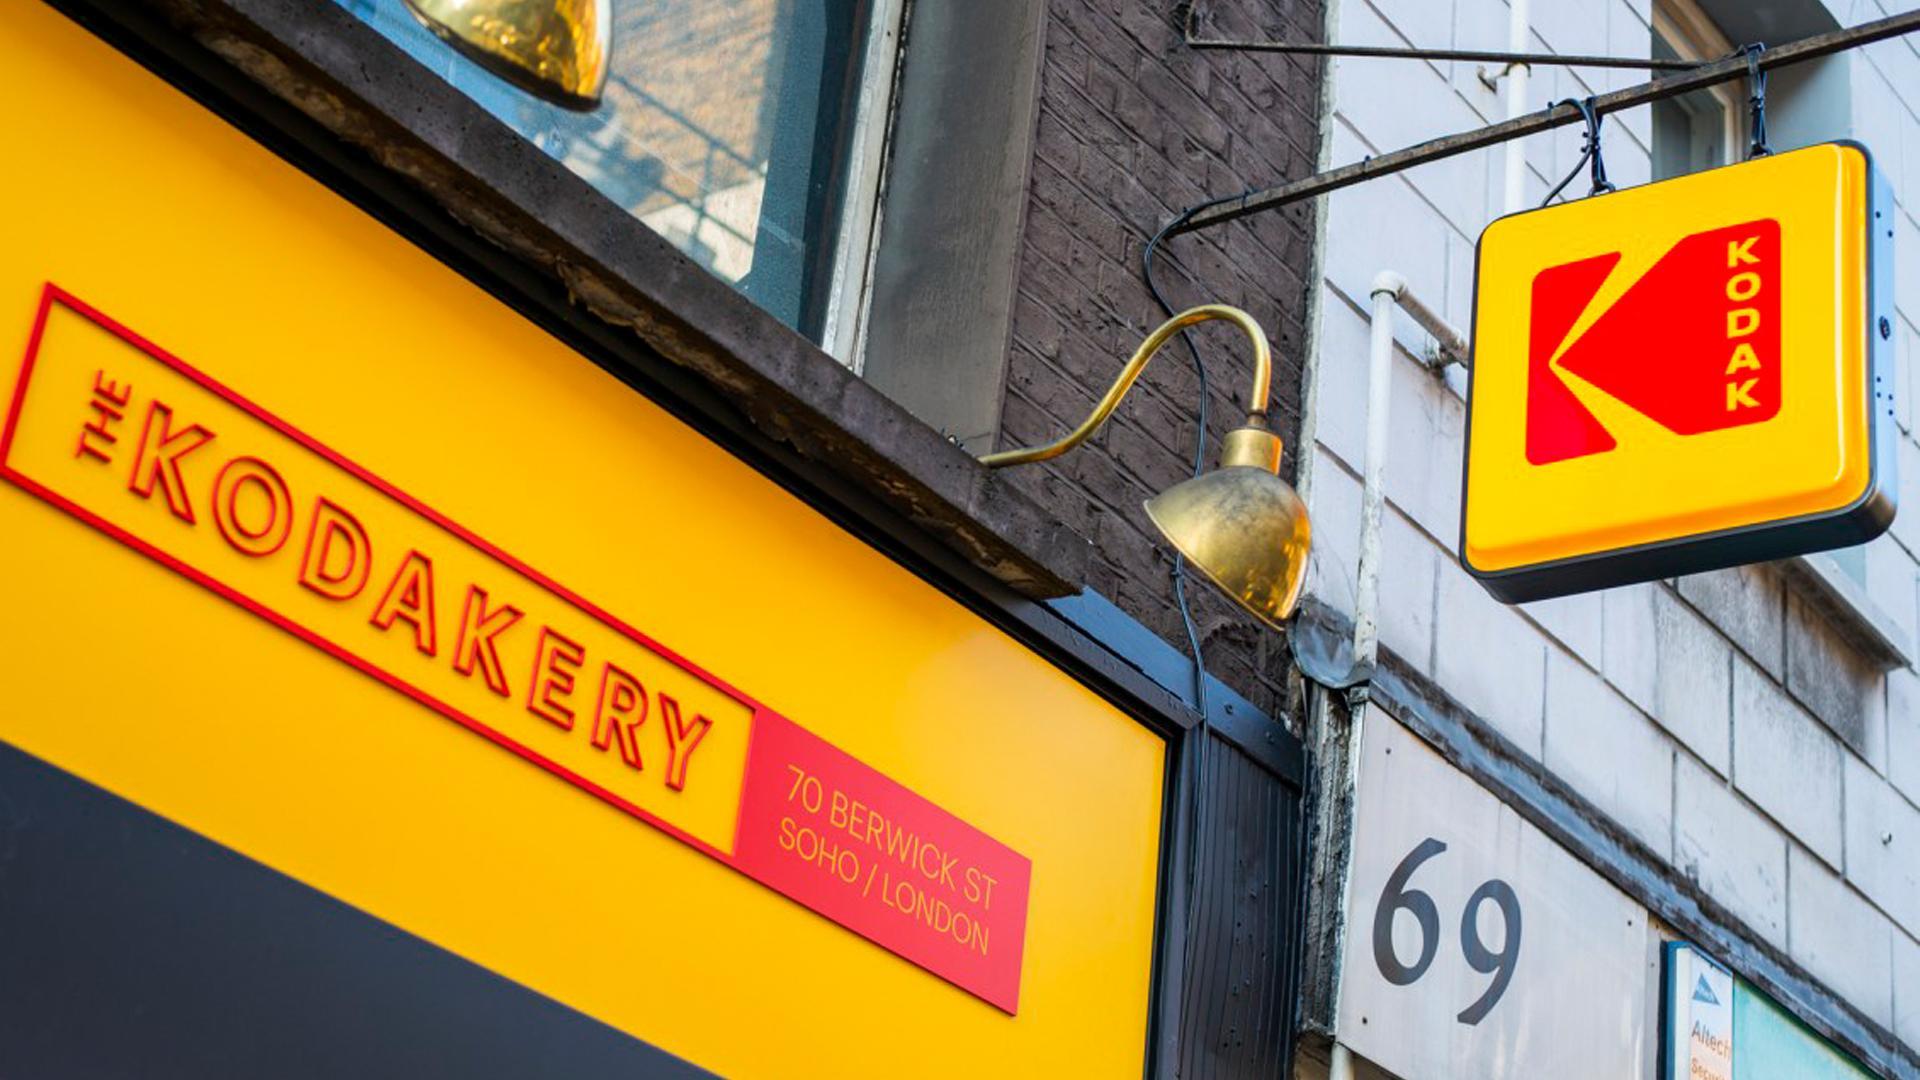 Kodak logo sign the Kodakery